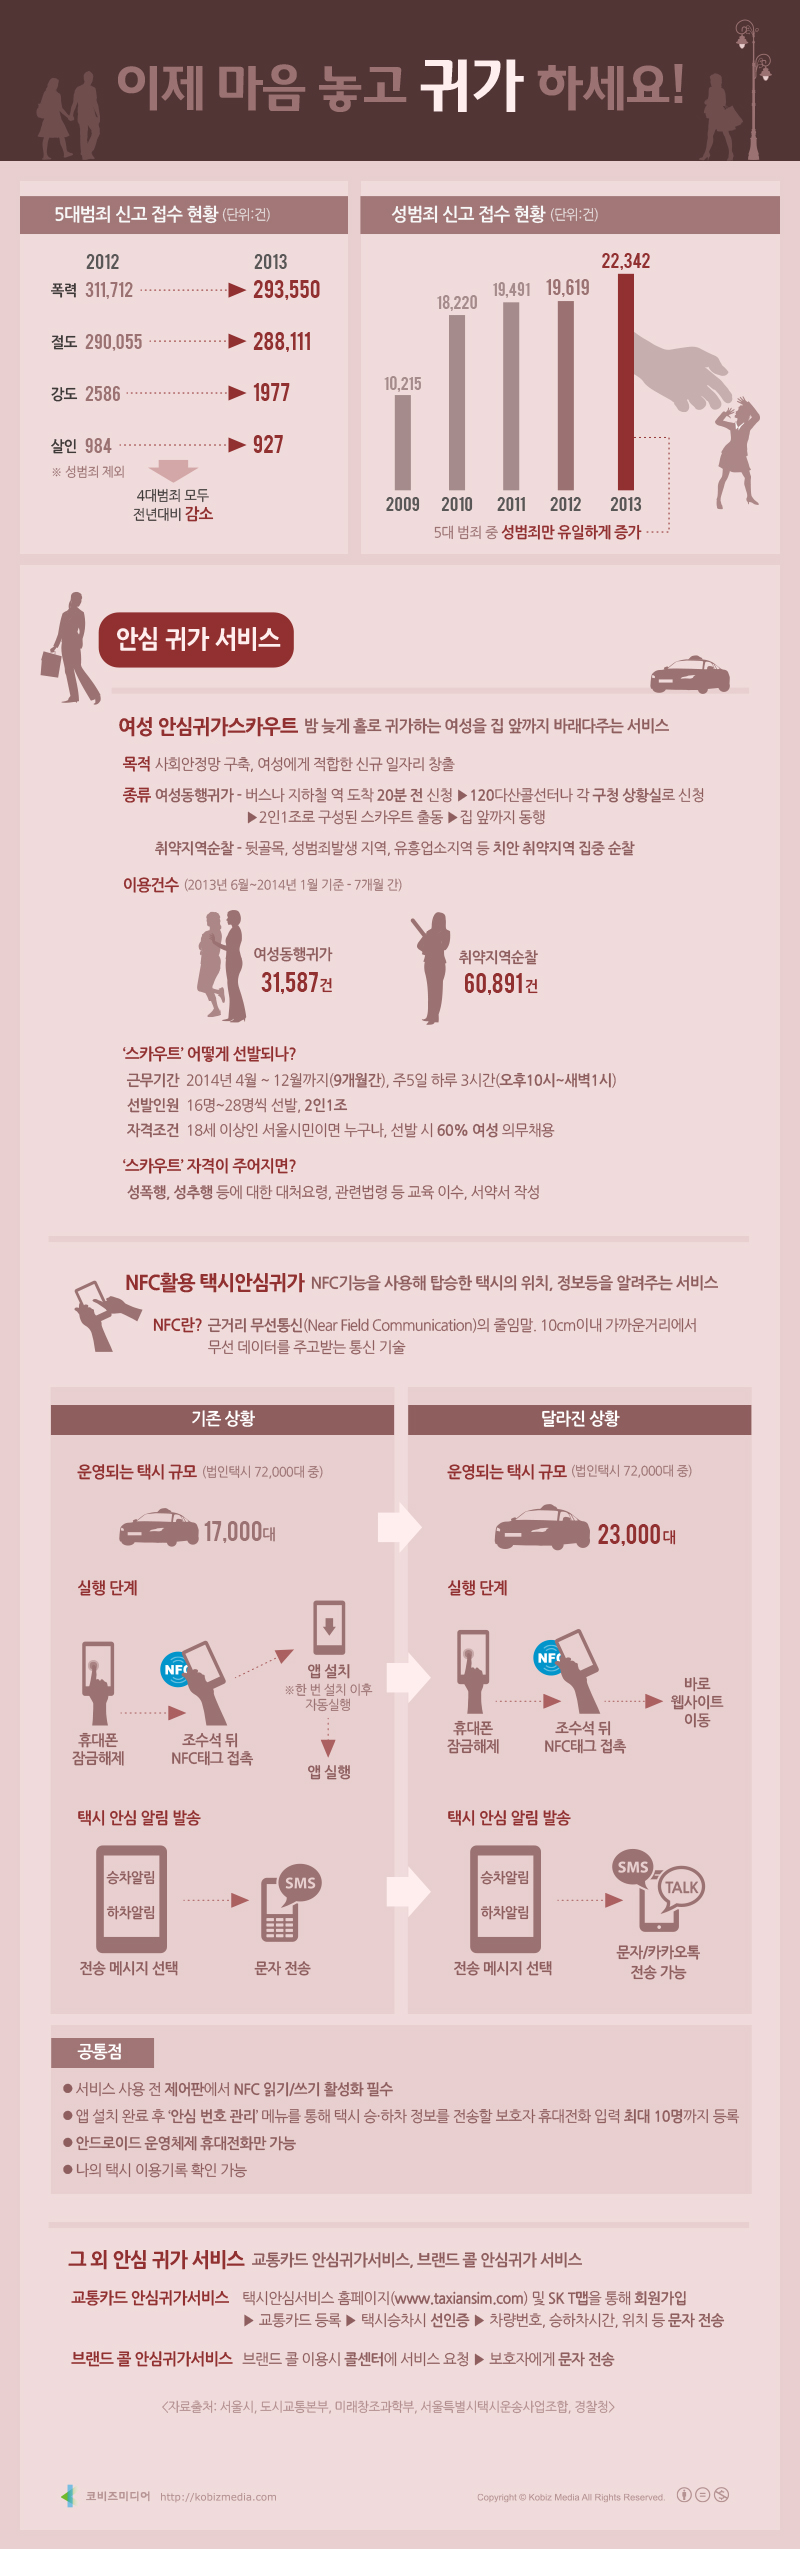 #Infographic [Korean]  이제 마음놓고 귀가하세요!